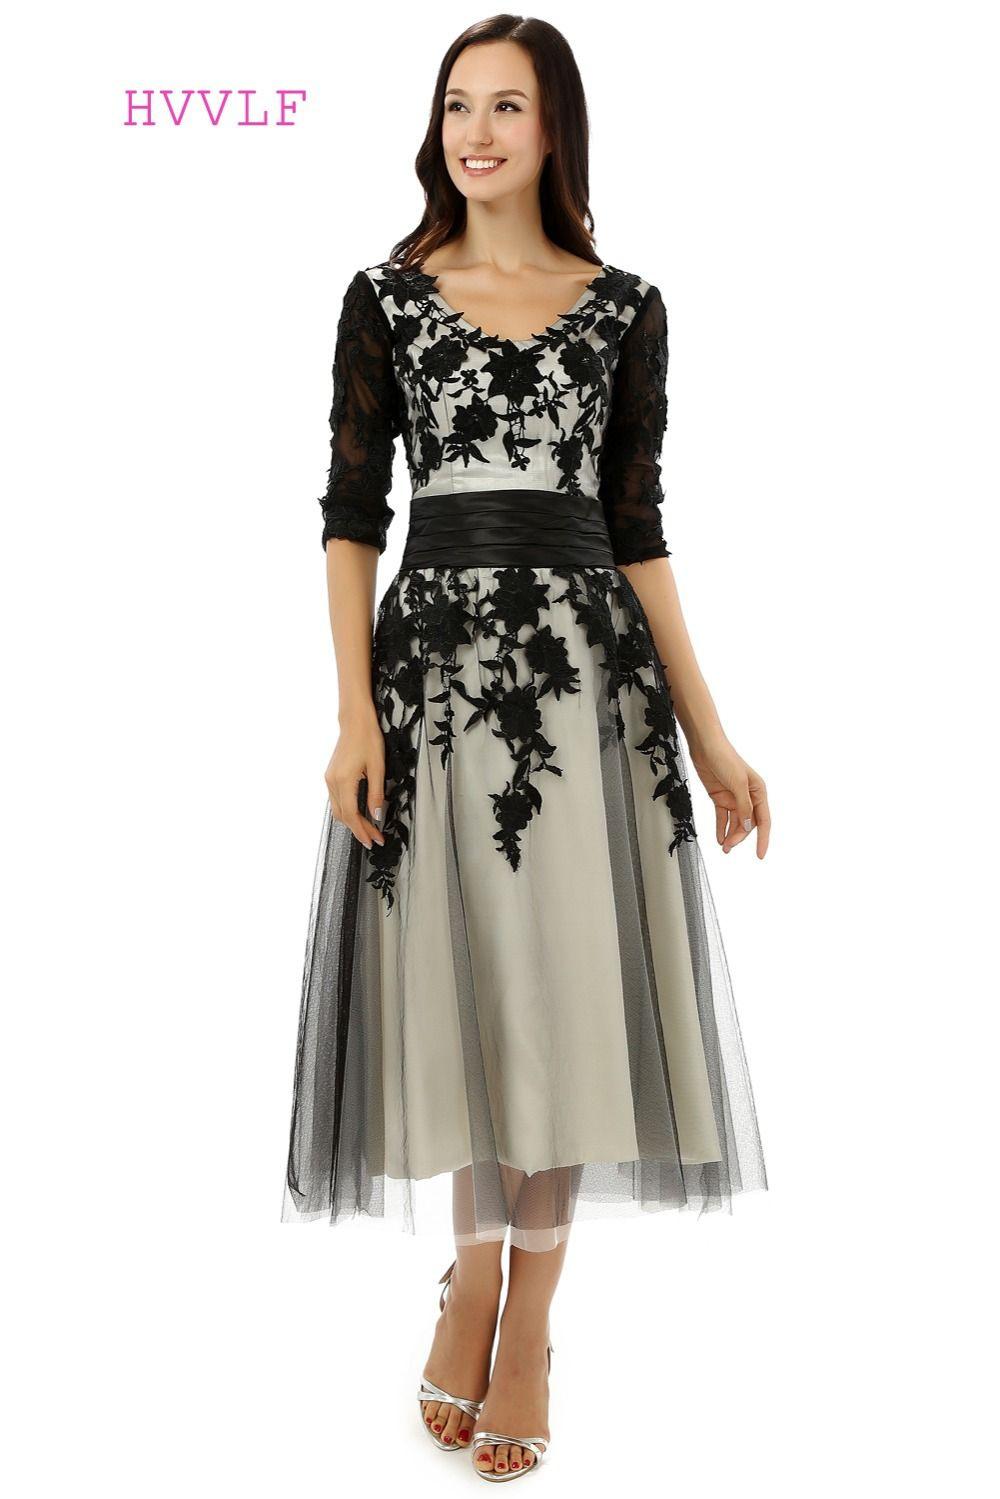 Designer Genial Halblange Abendkleider Stylish13 Luxus Halblange Abendkleider Spezialgebiet